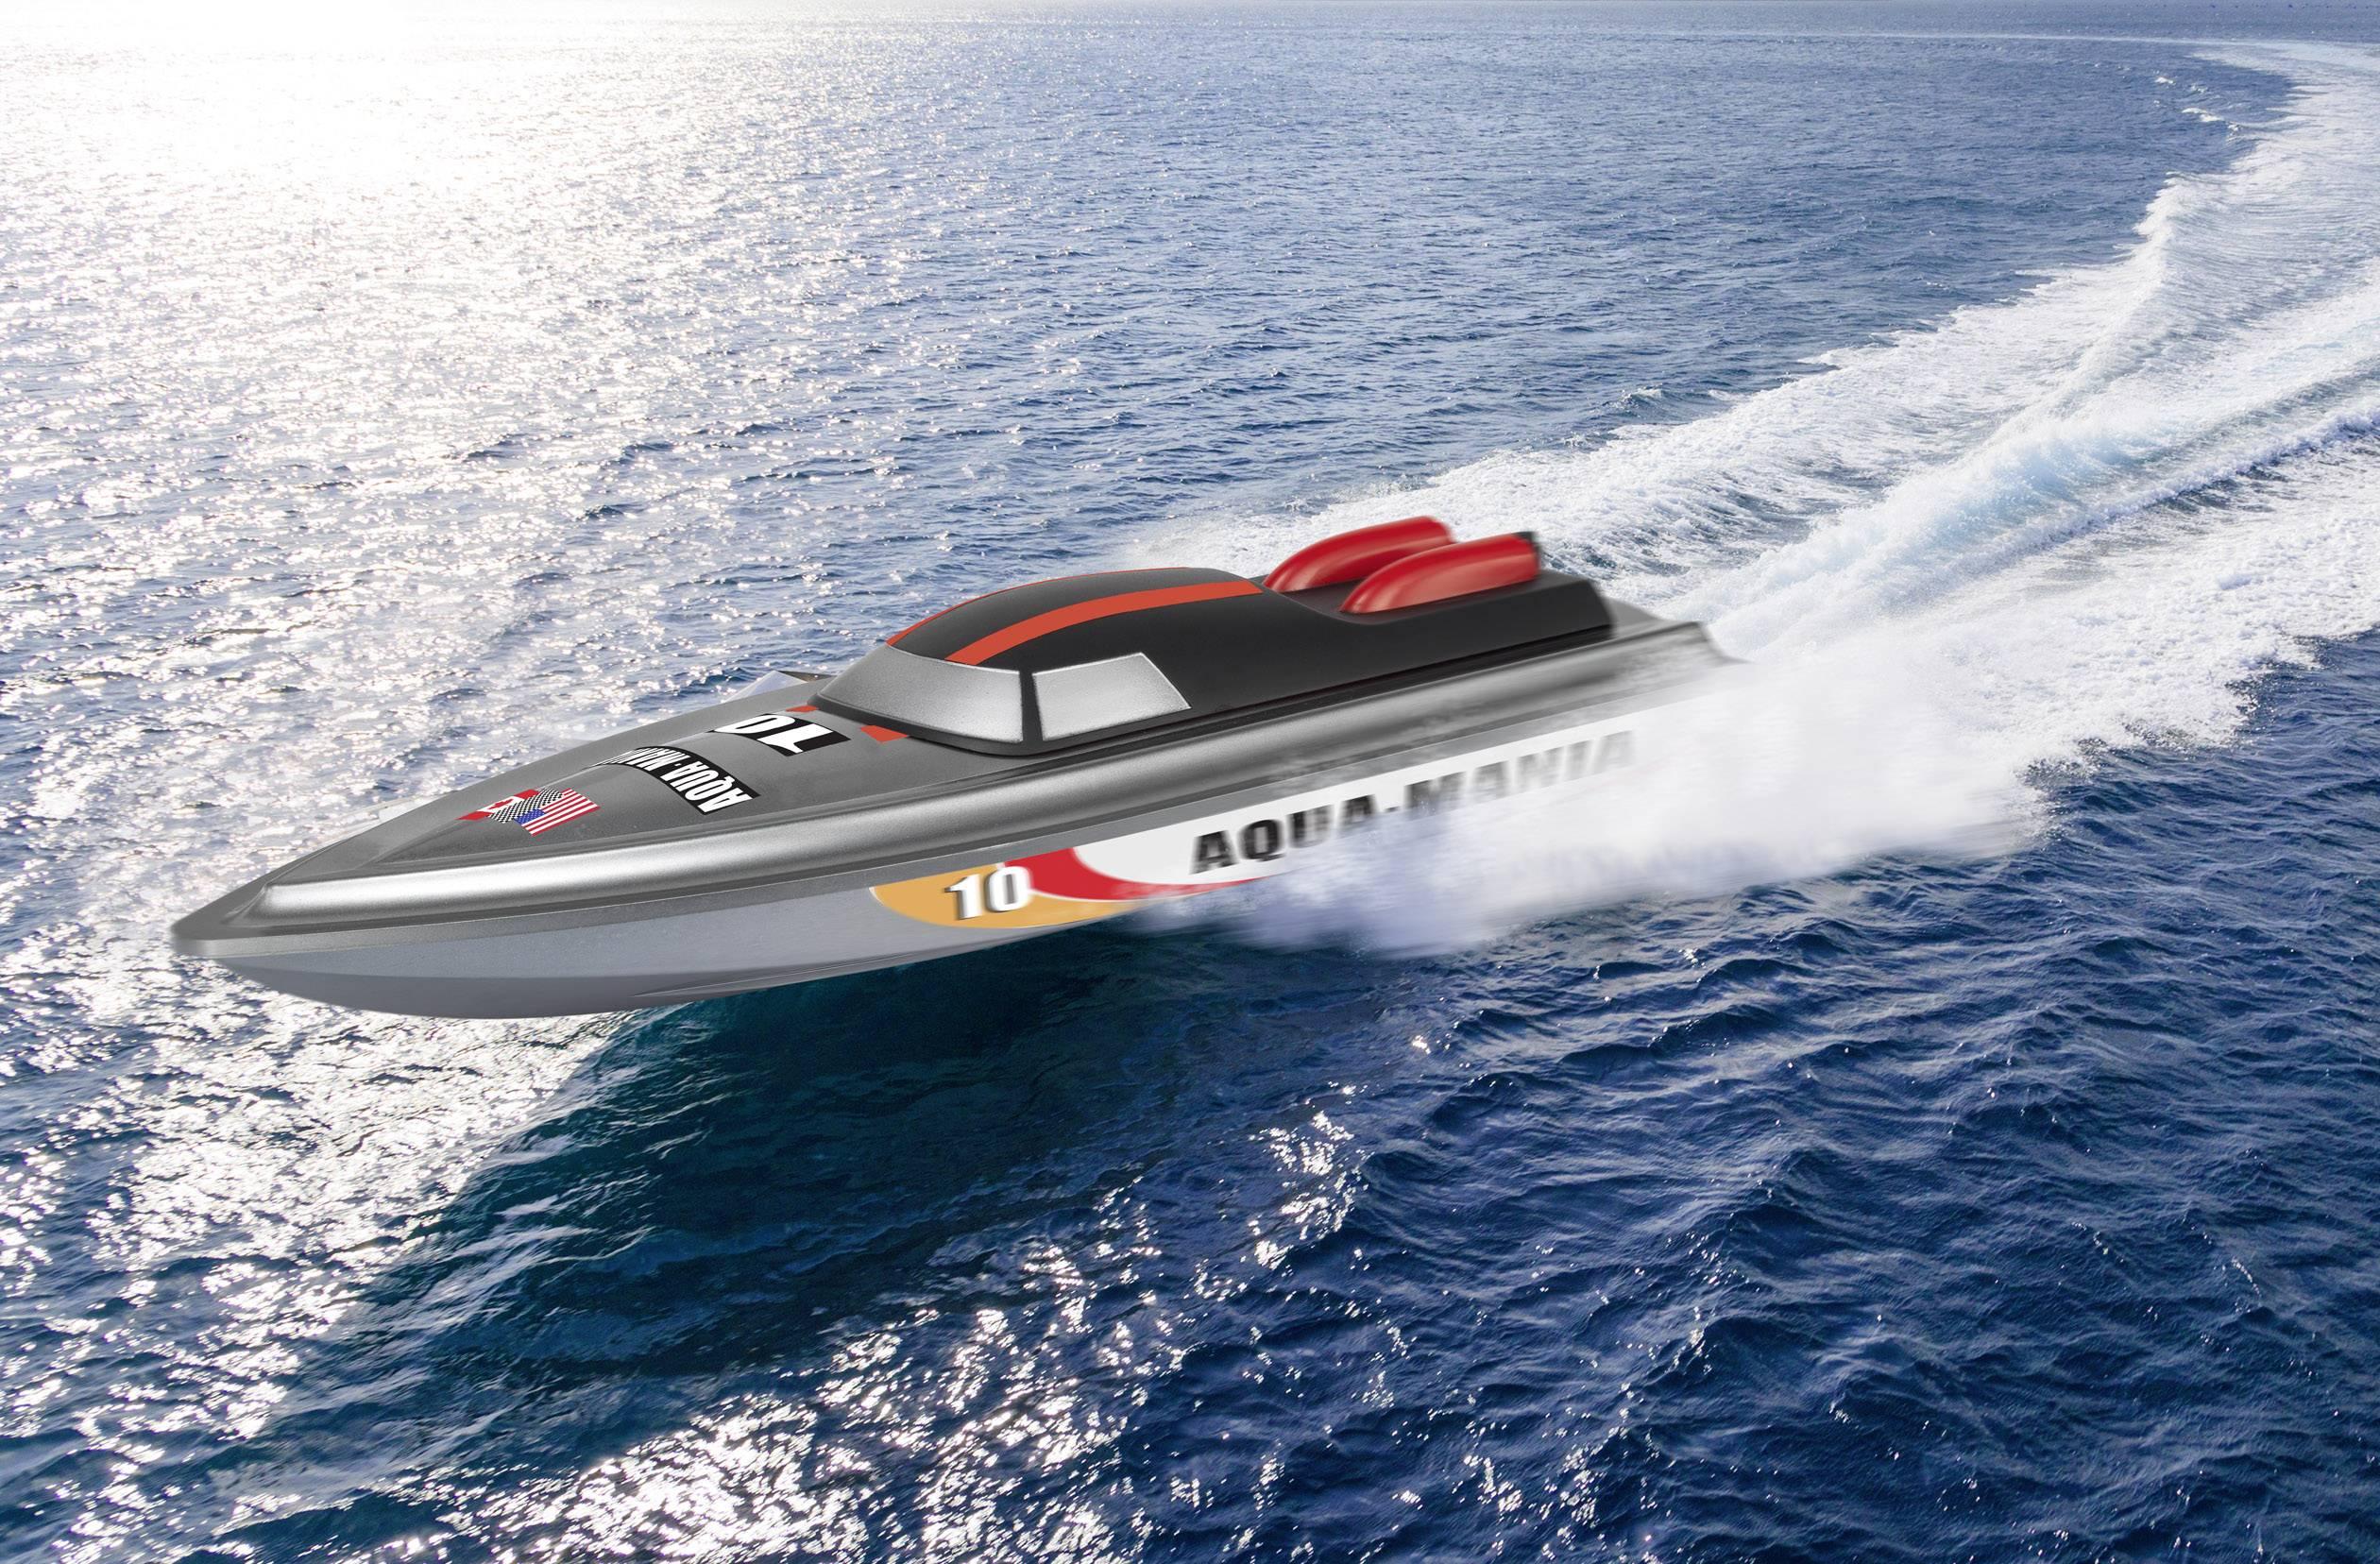 Reely Mini Wave Breaker Rc Model Speedboat 100 Rtr Conradcom